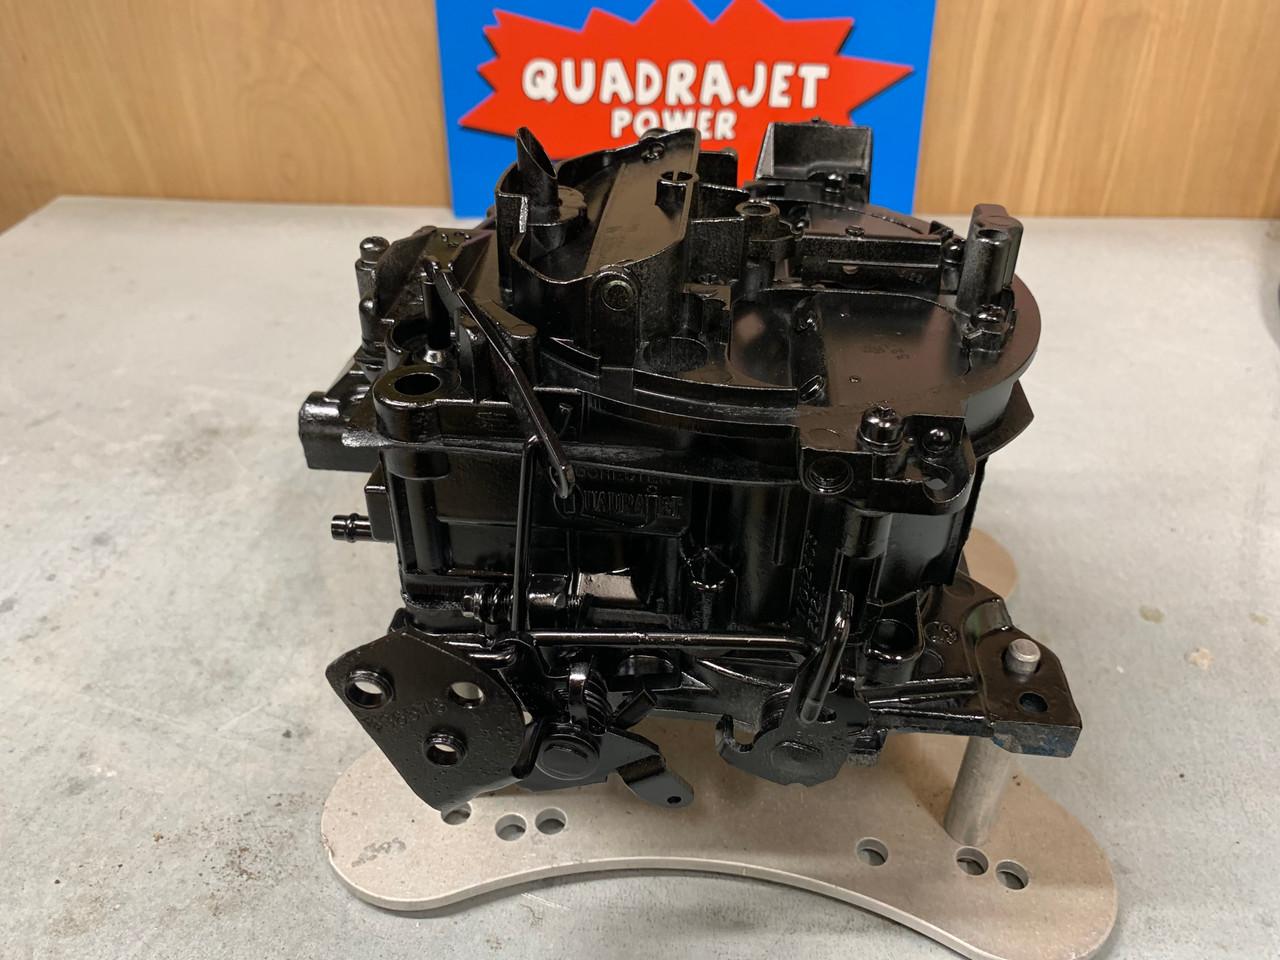 Marine Quadrajet Rebuild Service